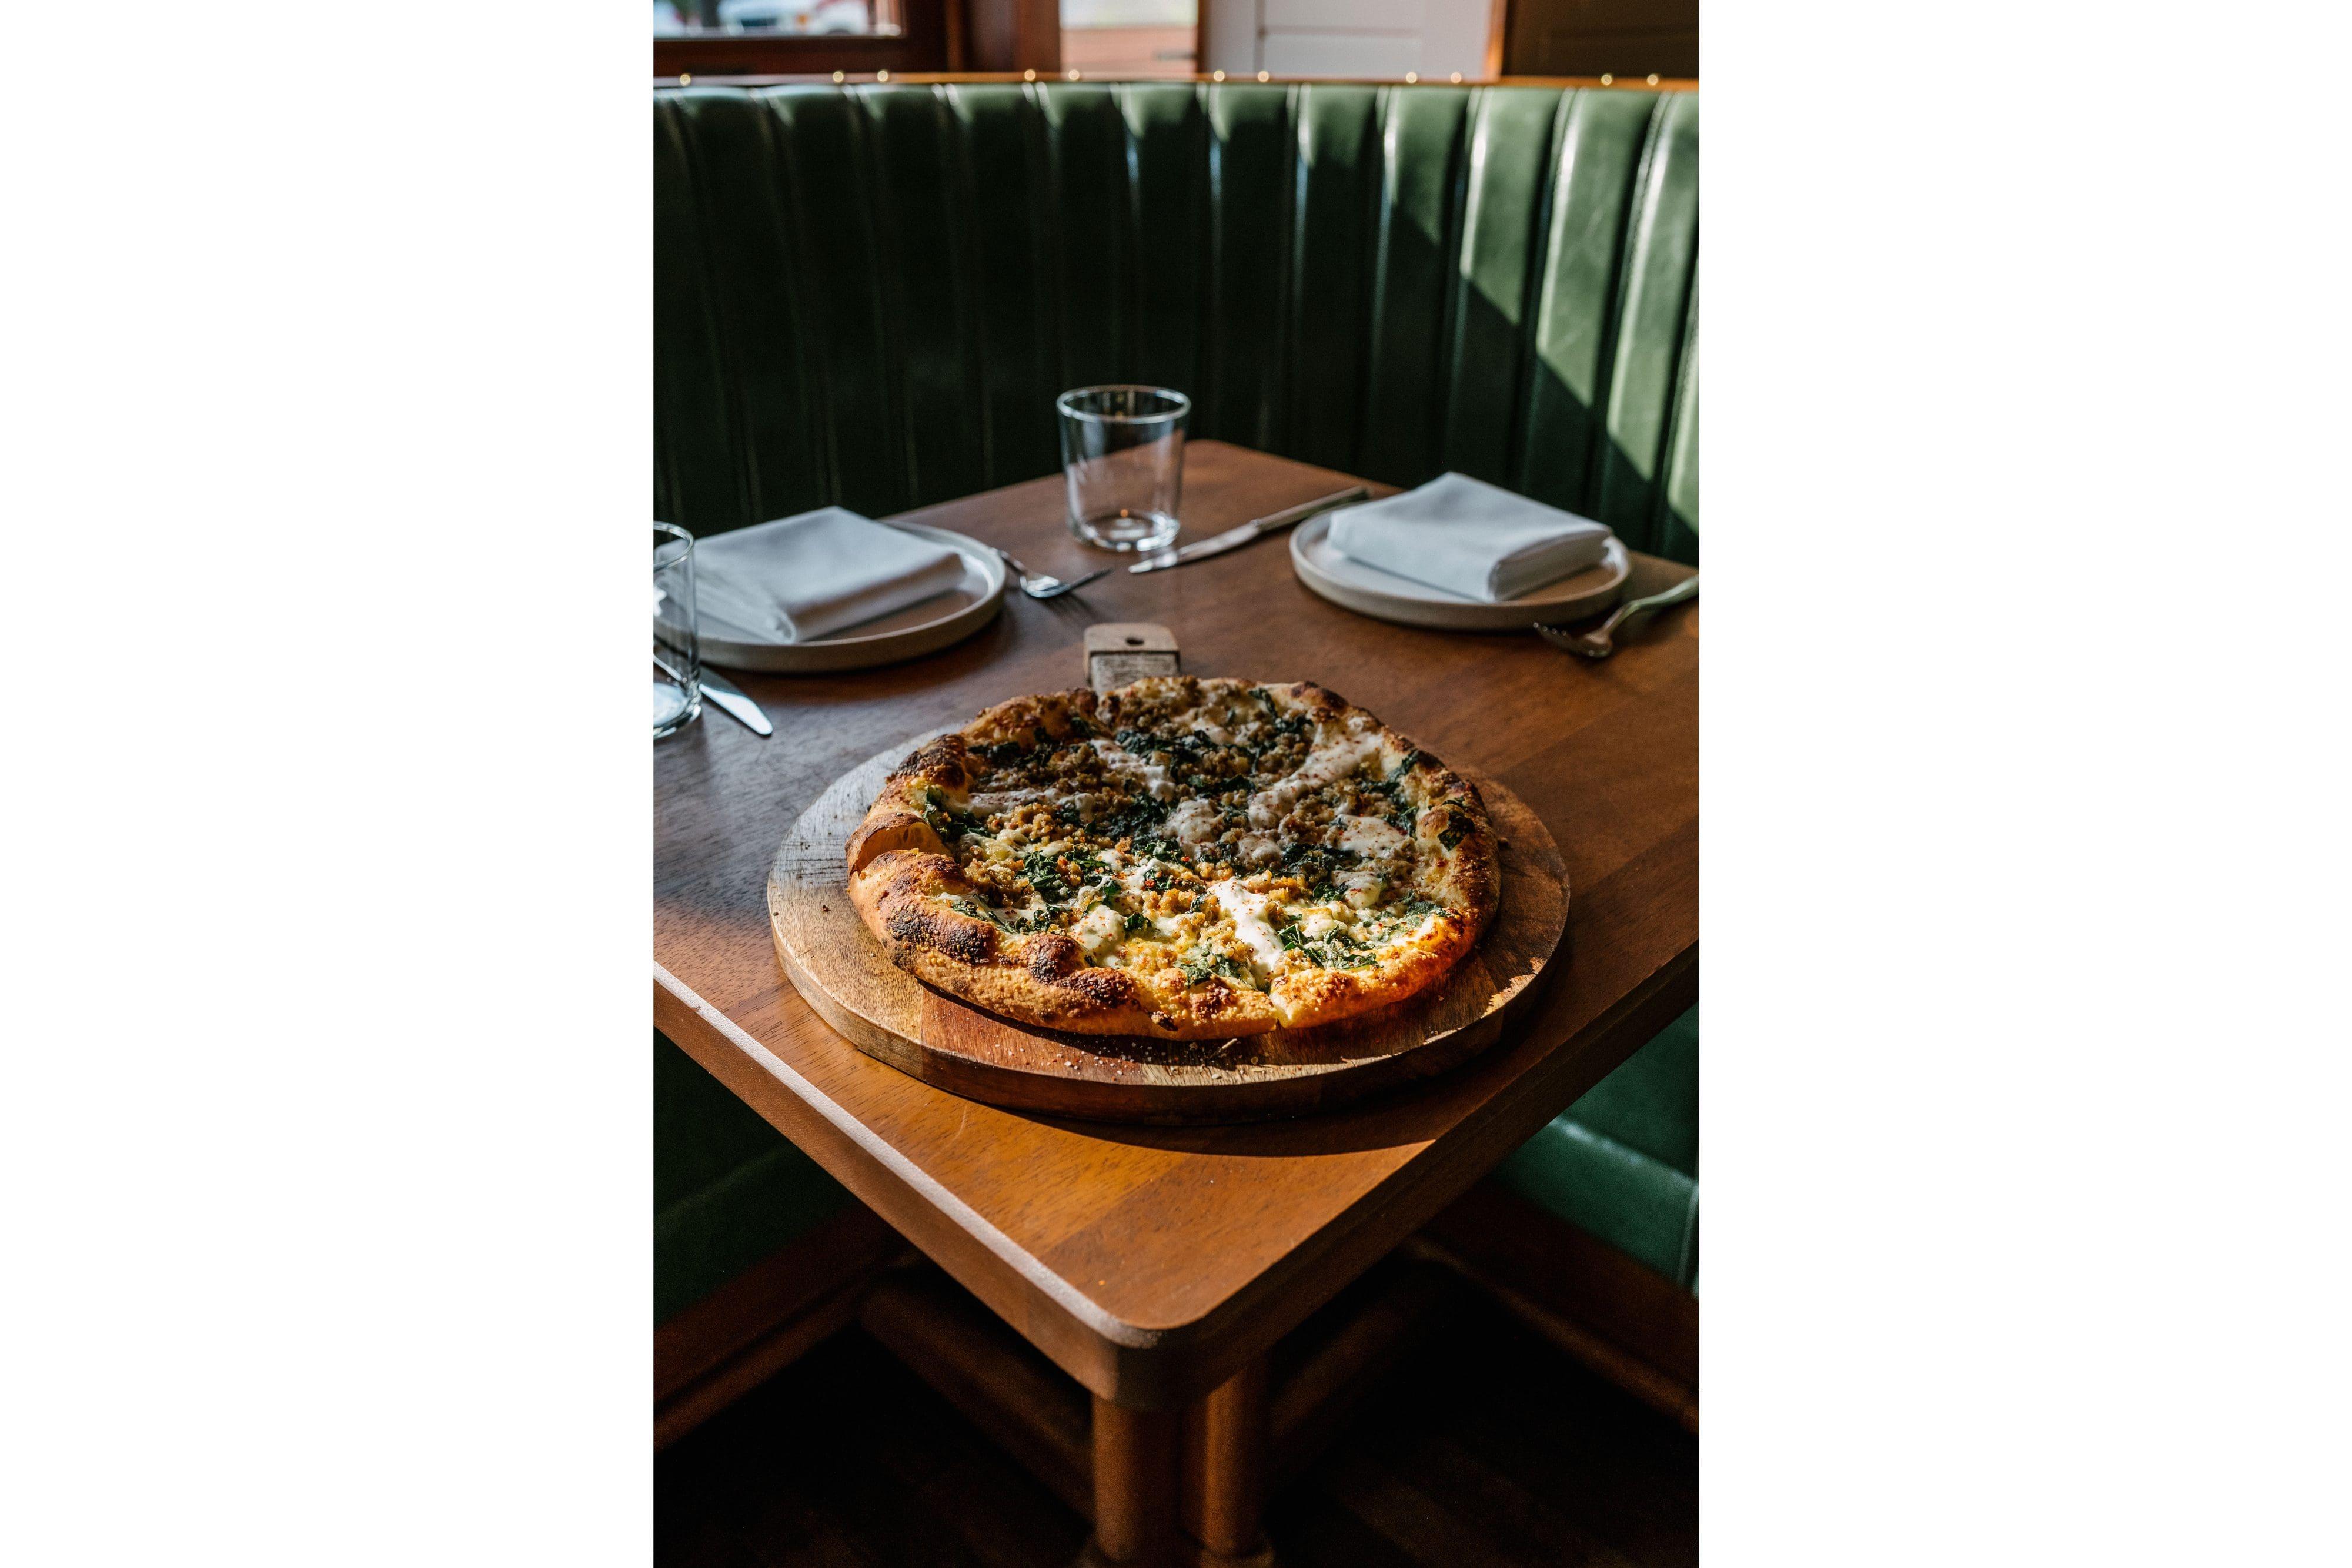 Pizza at a Miami SoFi restaurant